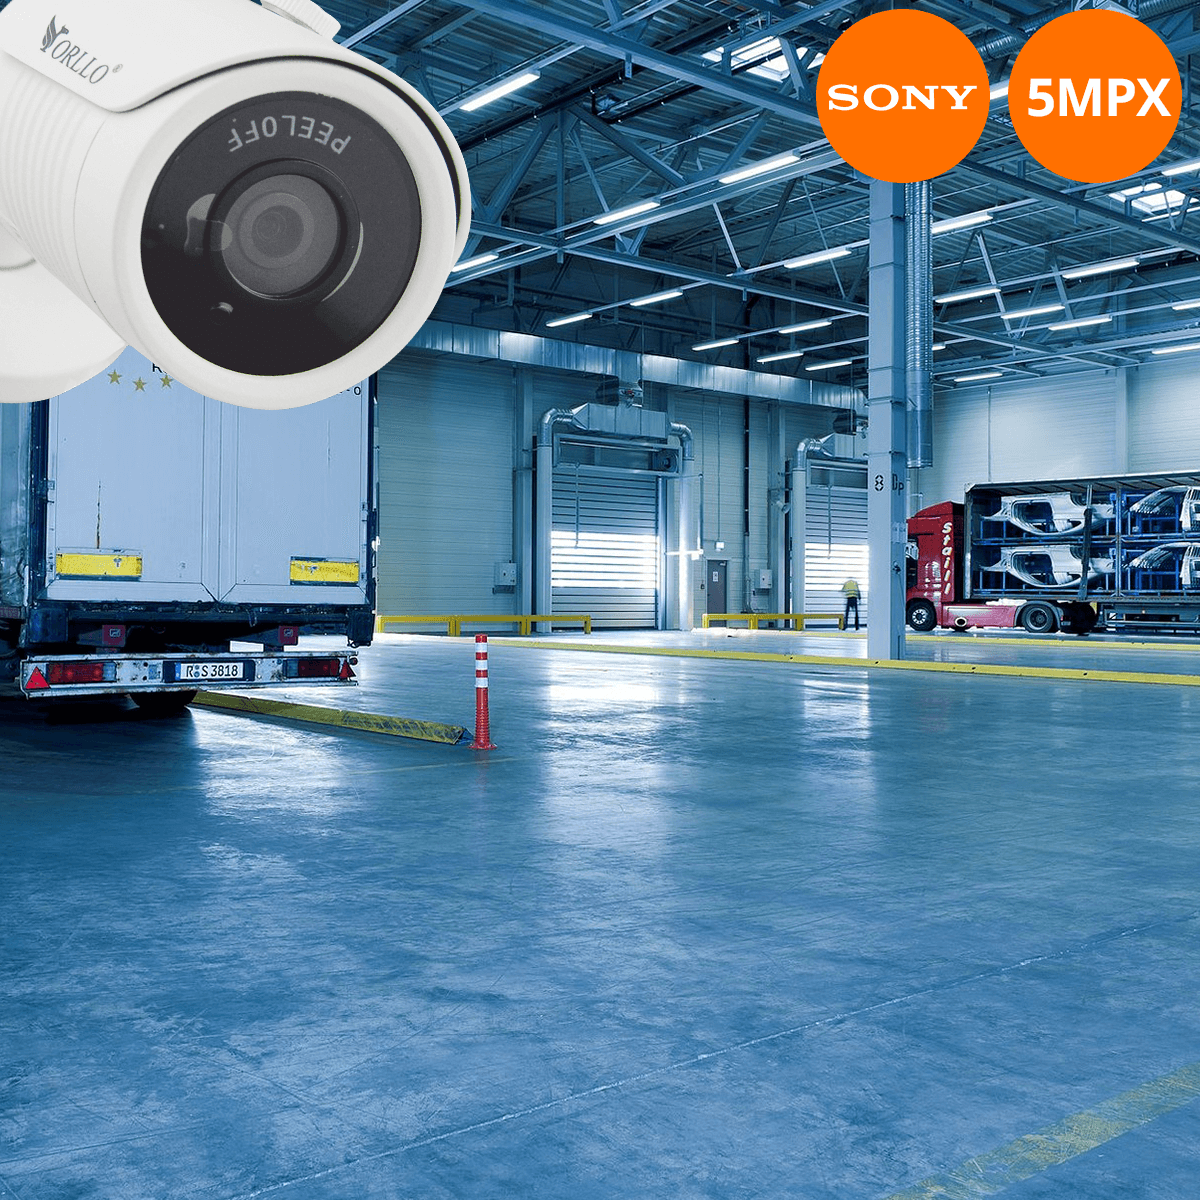 kamery monitoring domu 5mpx orllo.pl